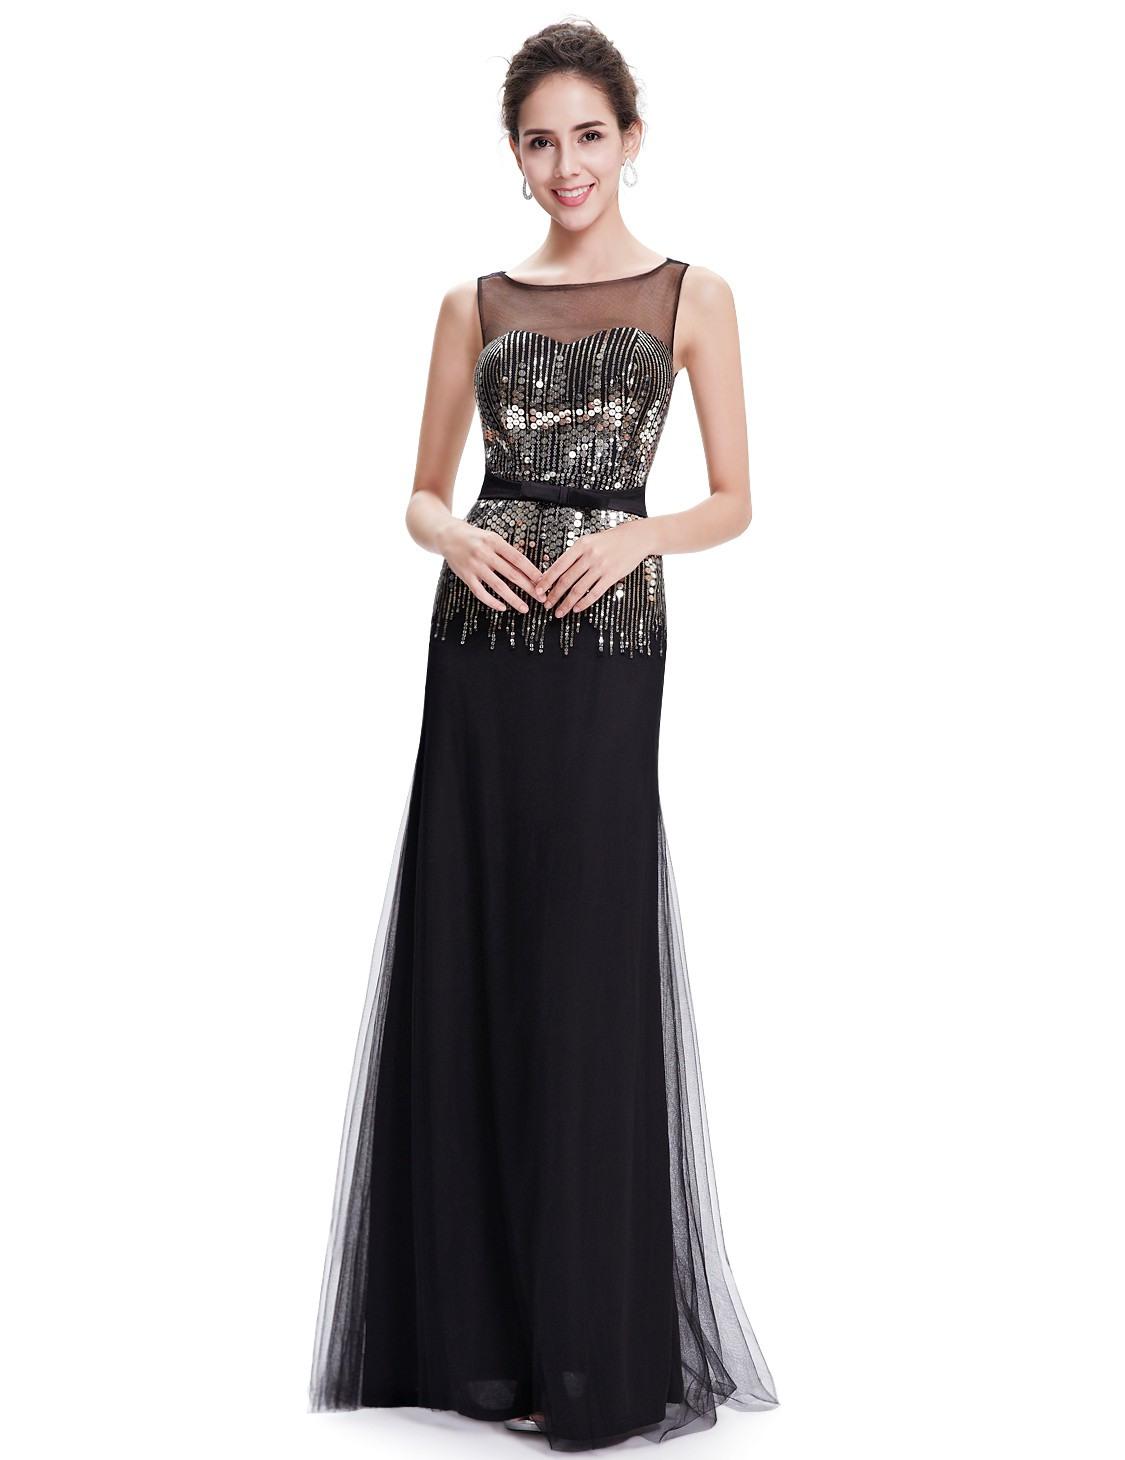 17 Genial Abendkleid Online Bestellen Stylish17 Einzigartig Abendkleid Online Bestellen Bester Preis